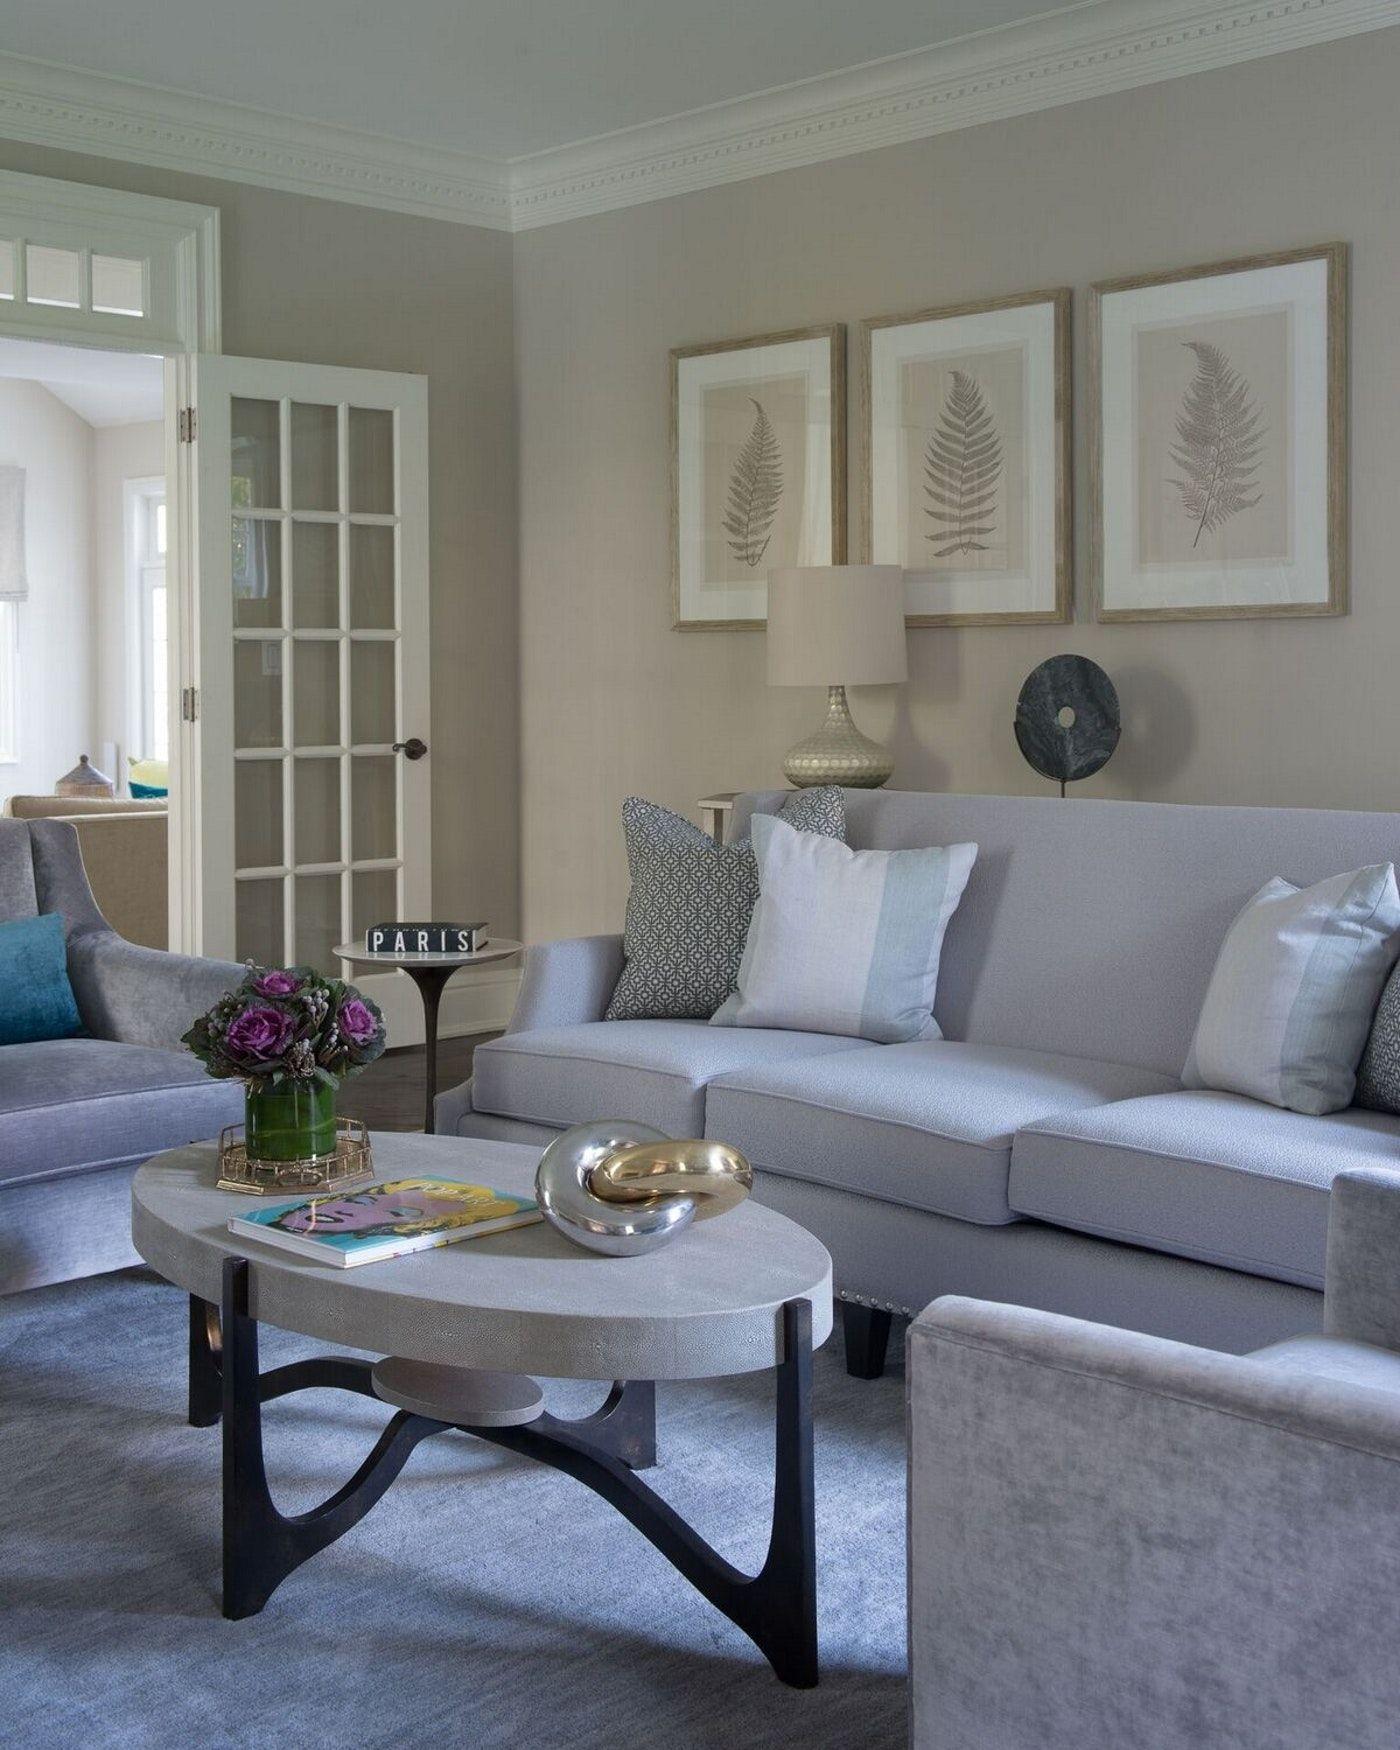 Relax Living Room Beige Walls White Trim Soft Blue Furnishings